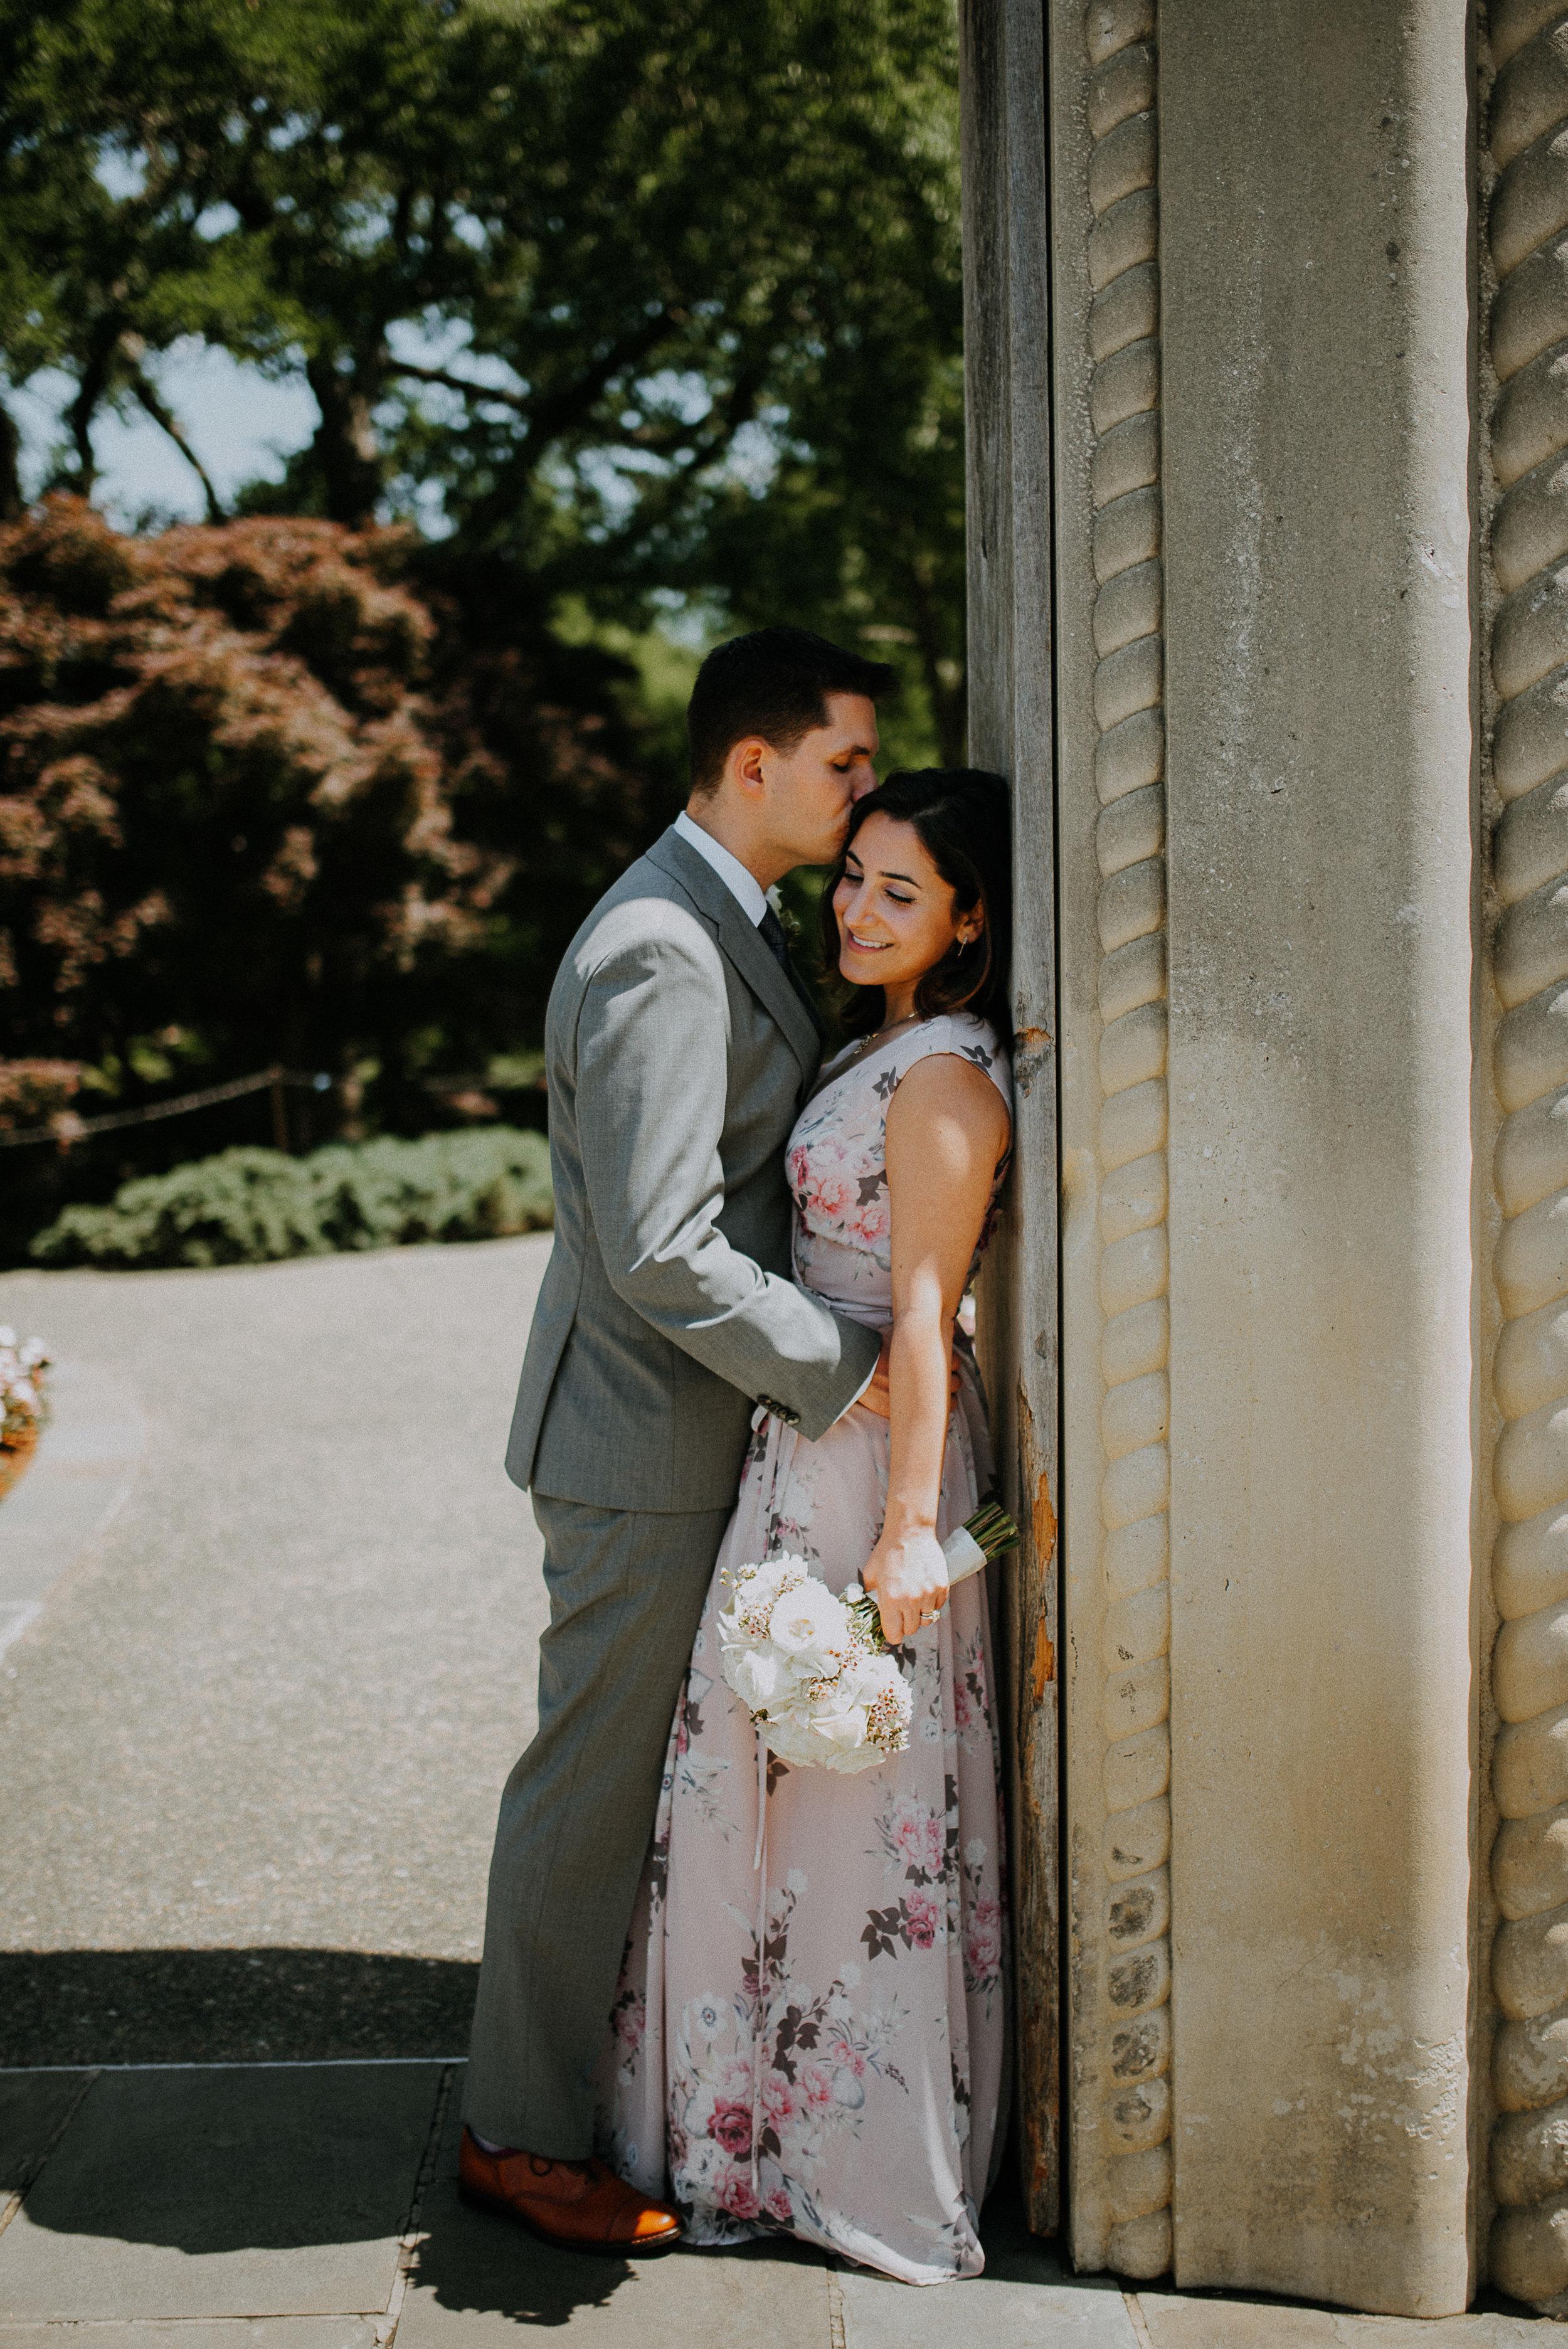 Dallas-fort-worth-wedding-photographer-dallas-arboretum-intimate-wedding-dallas-texas-36